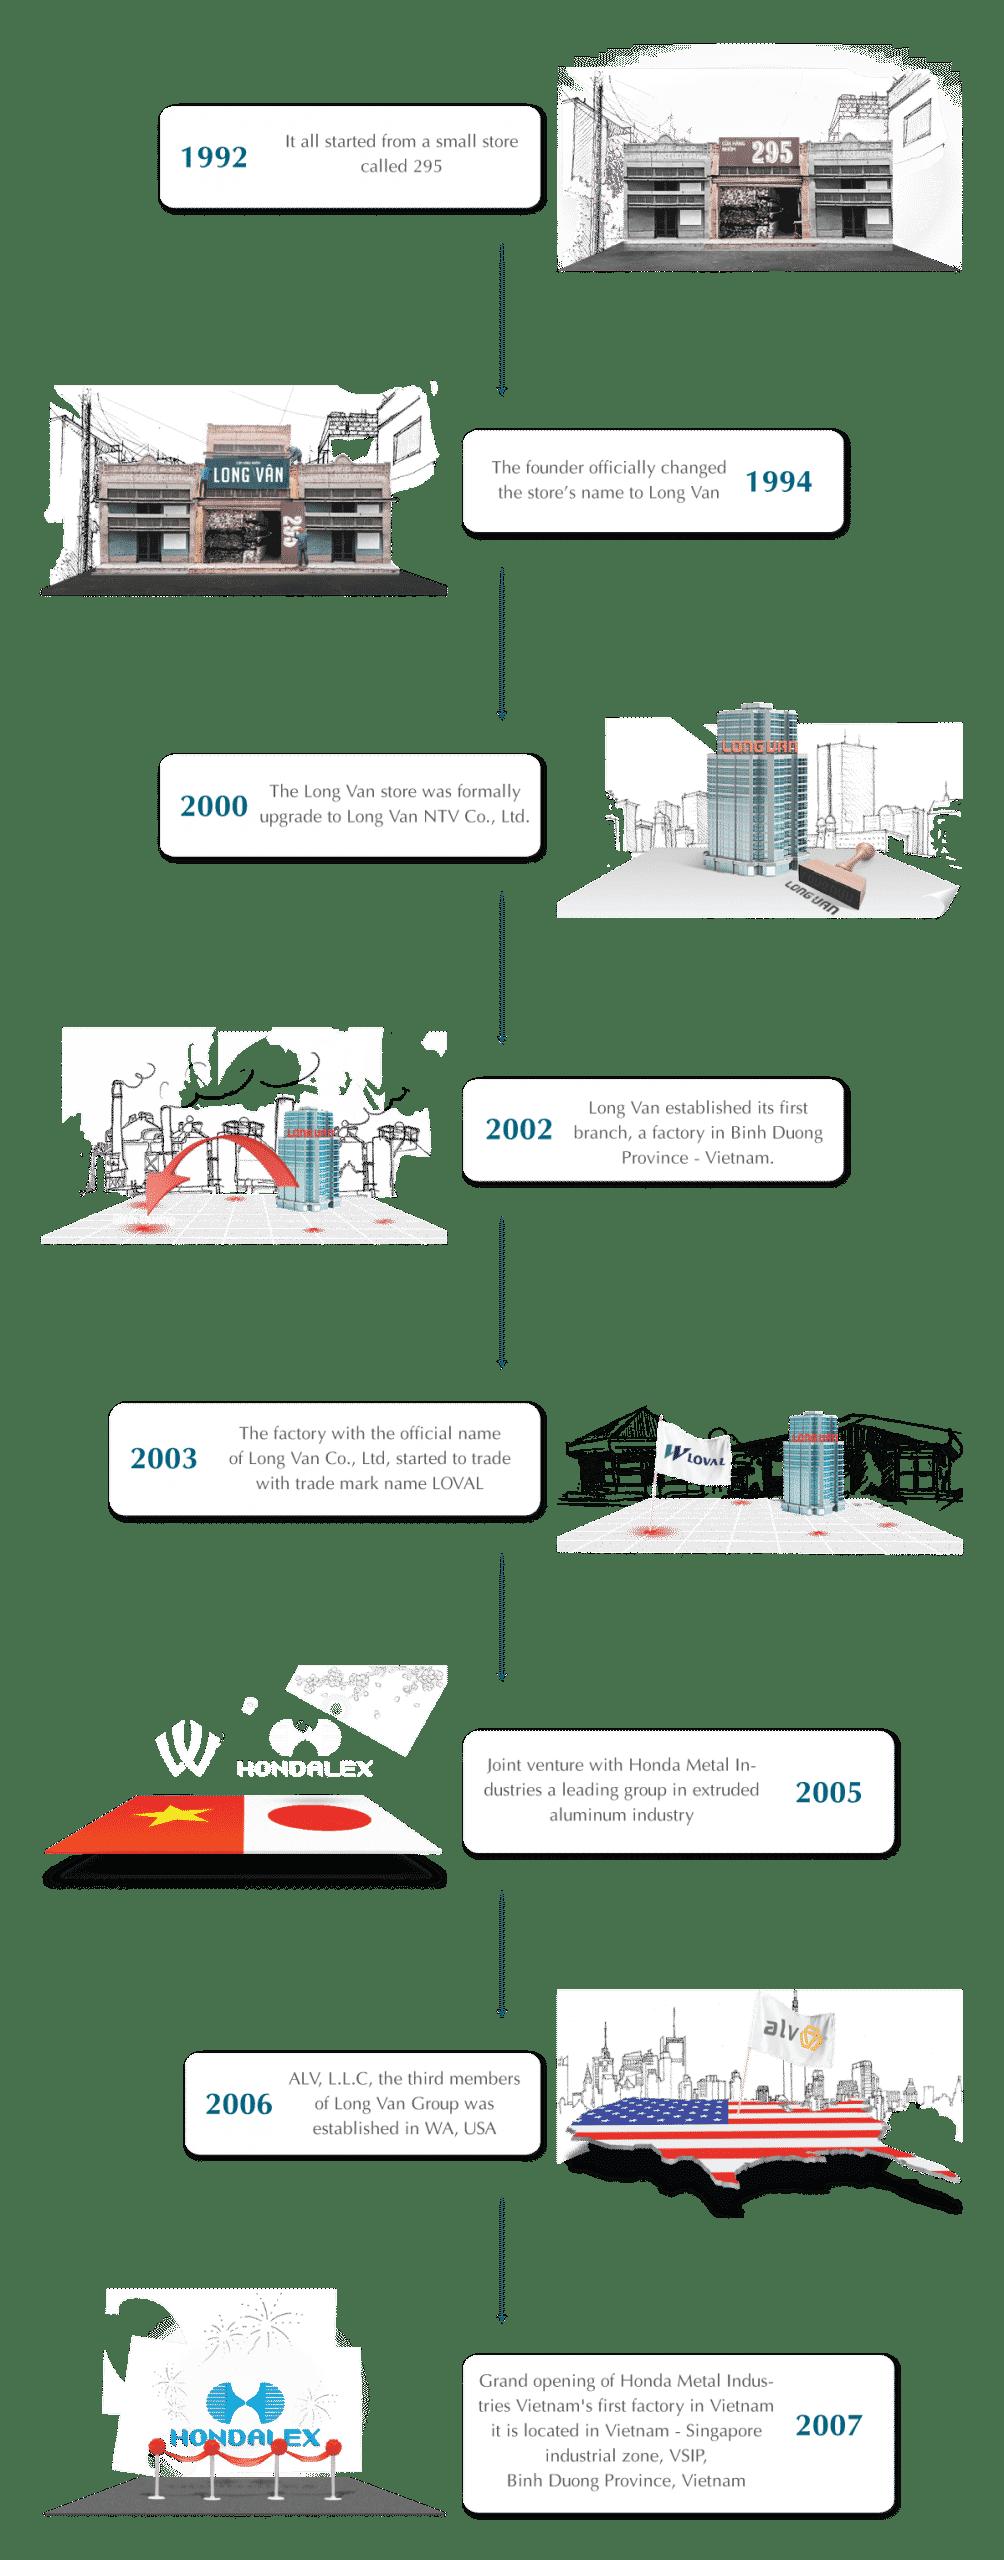 Brief History by Long Van Group